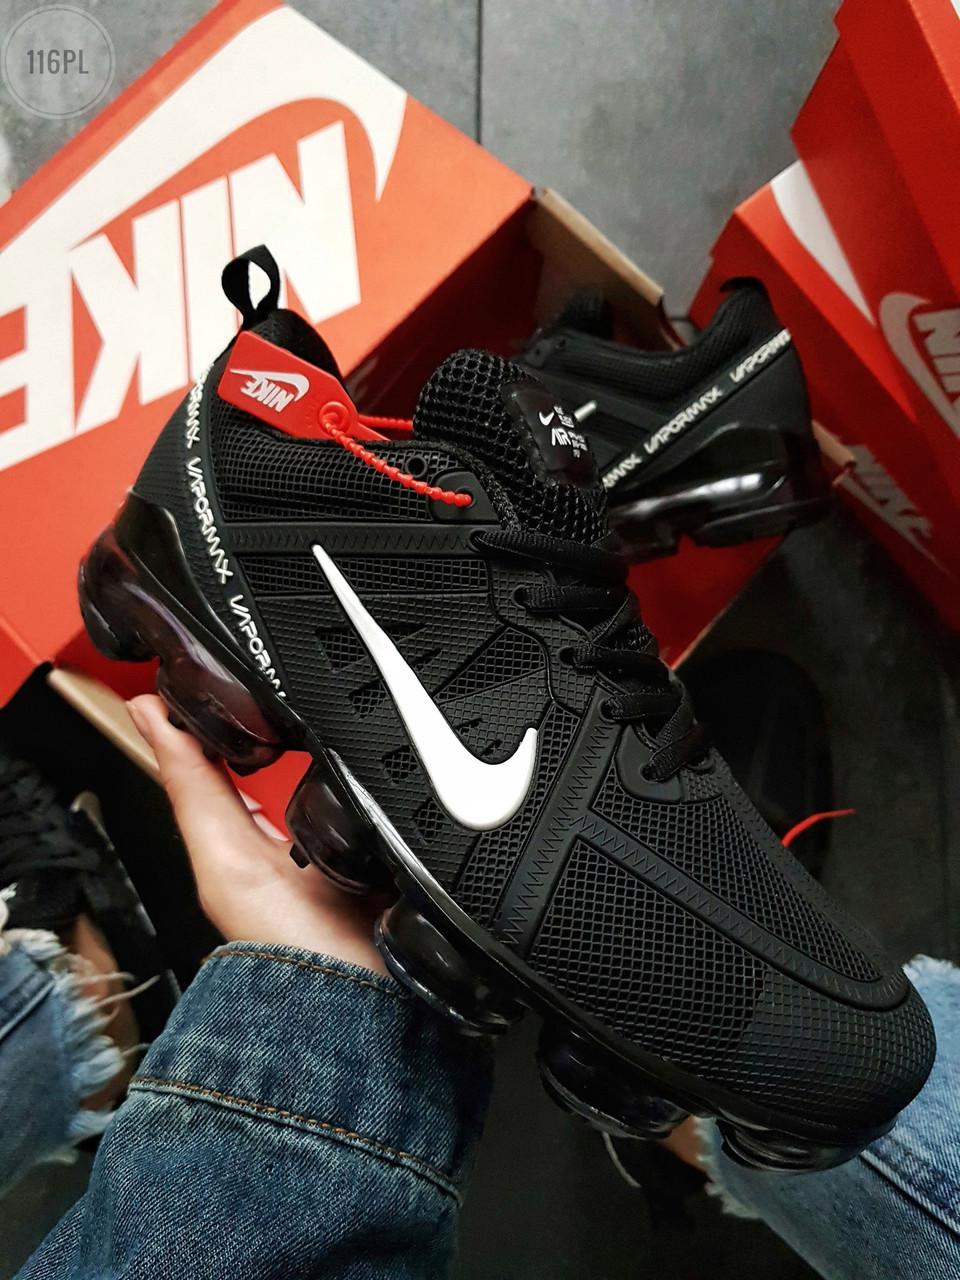 Мужские кроссовки Nike Vapormax 19 Kauchuk Black/White ( р. 43, 44) Черные